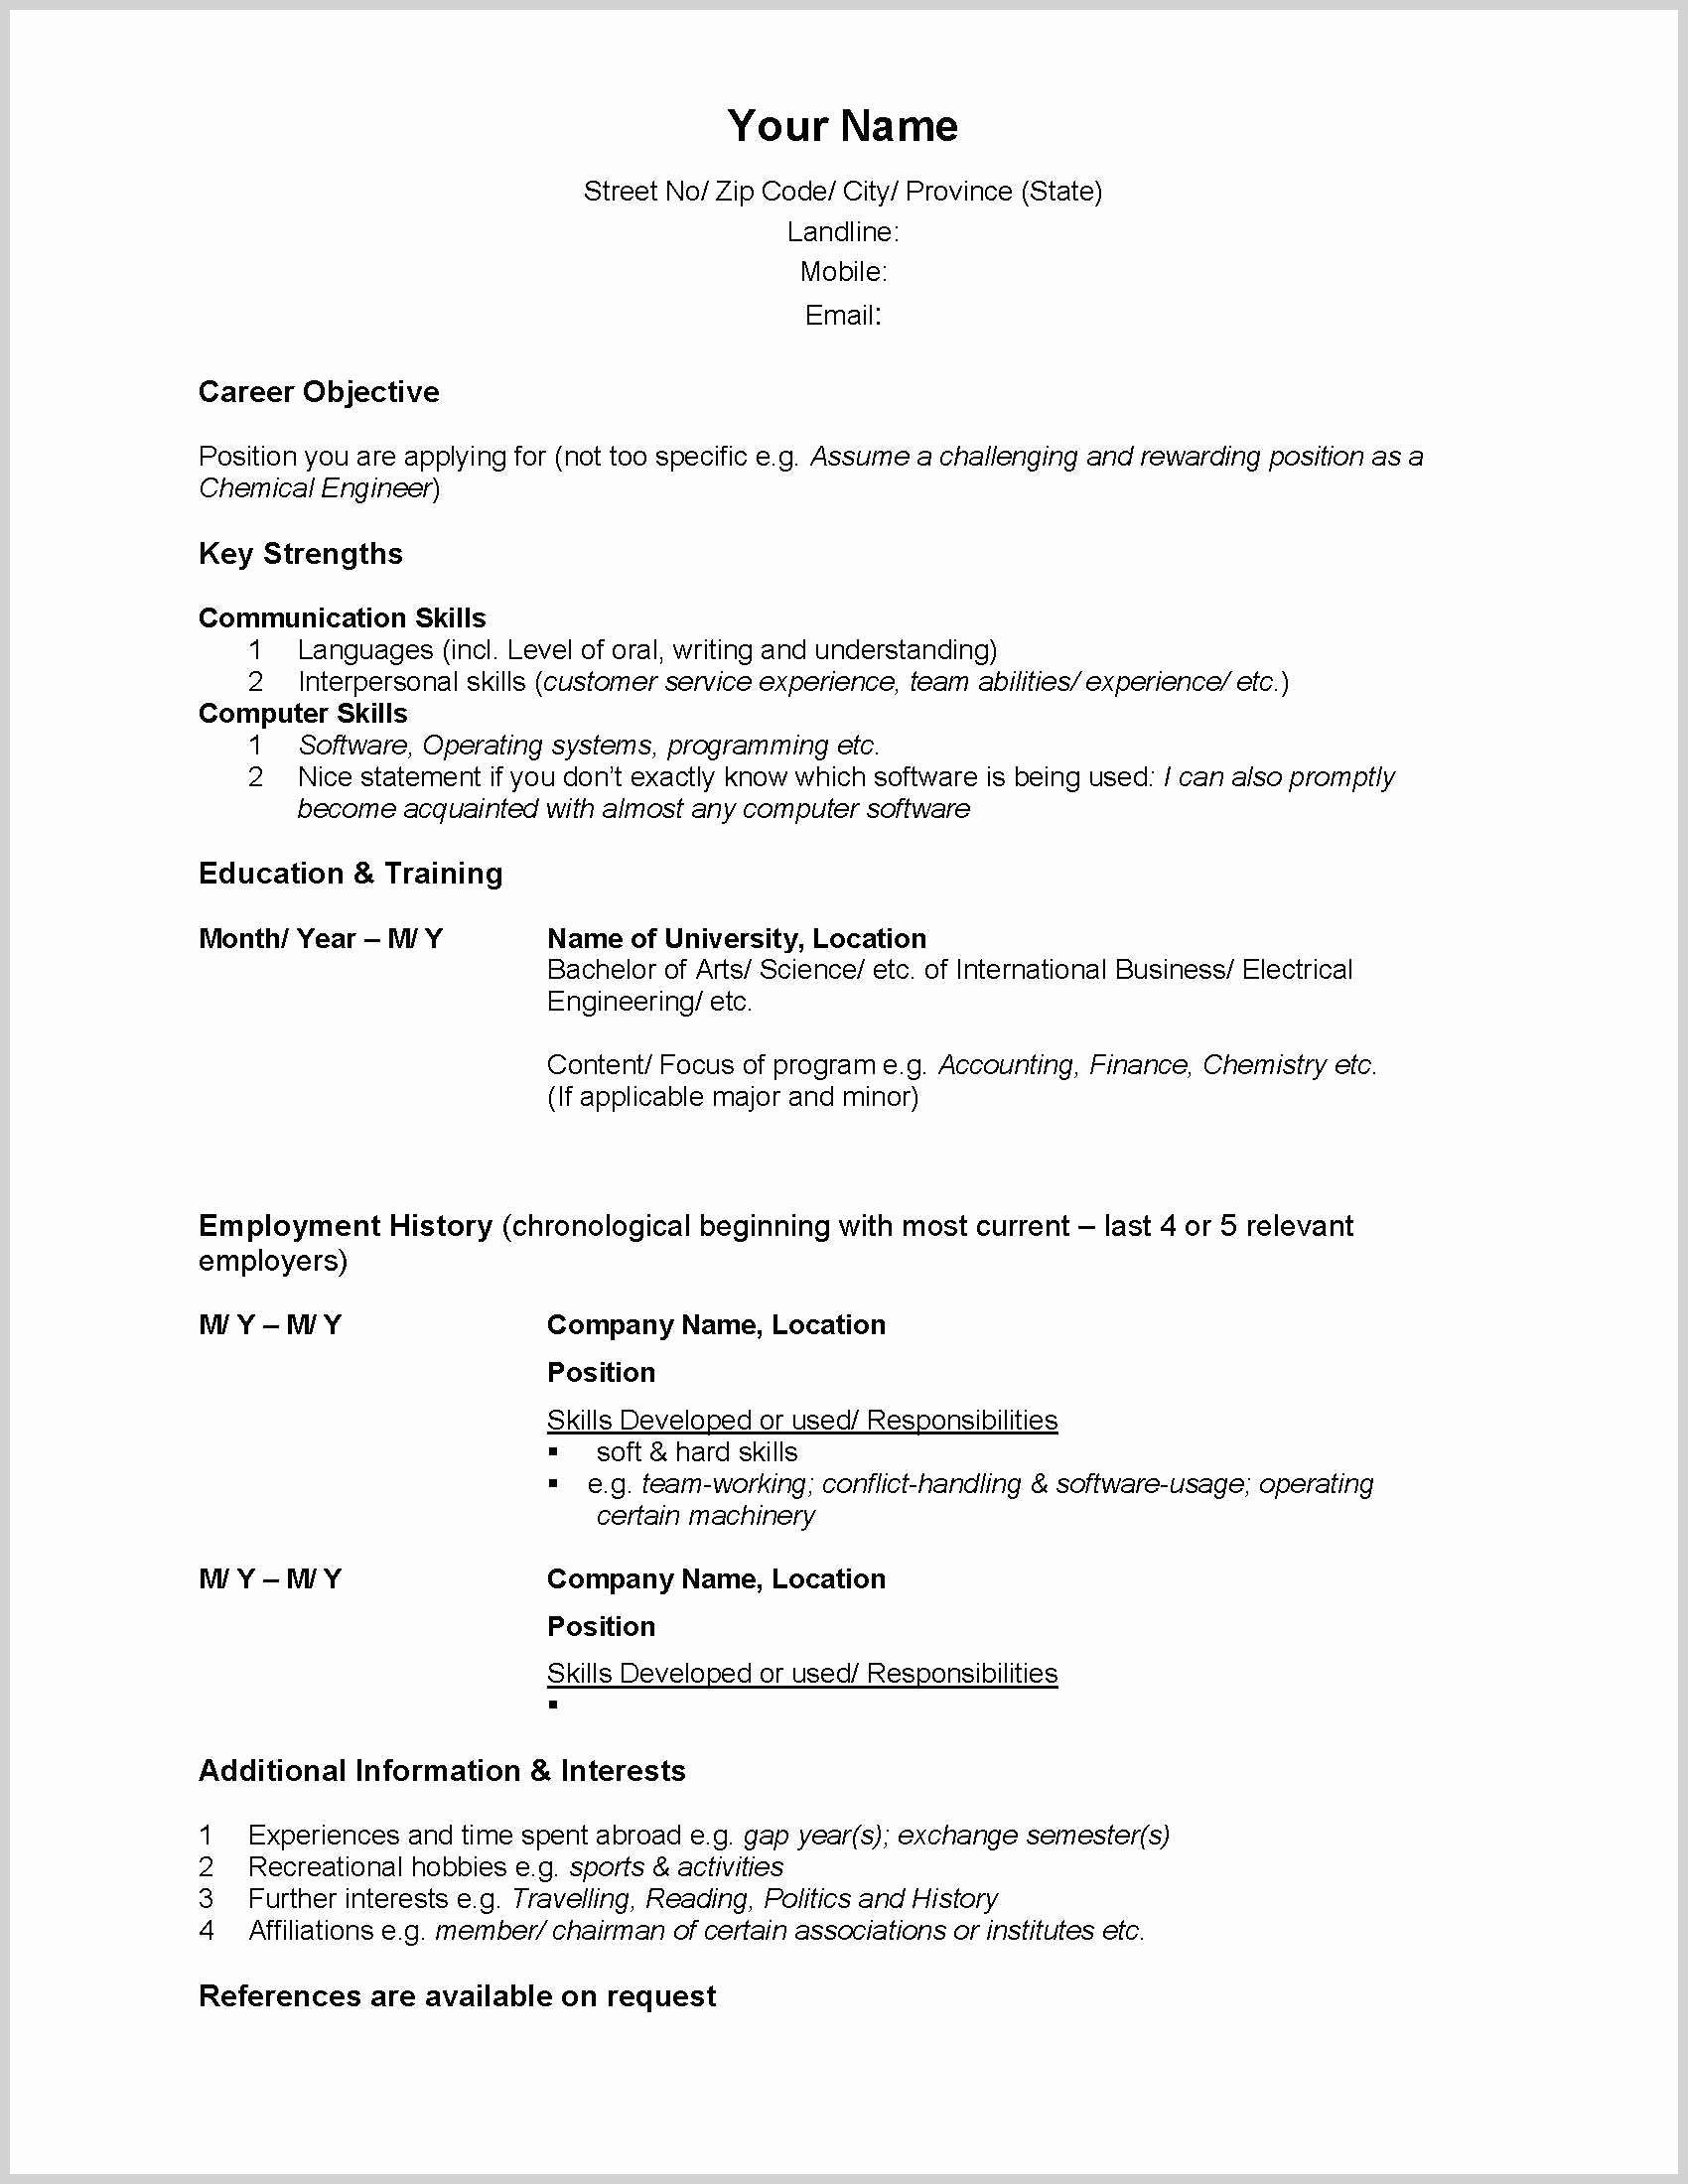 Soft Skills For Resume Awesome Soft Skills Examples For Resume Benigebra Inc News Resume Inspiration Resume Skills Resume Template Resume Profile